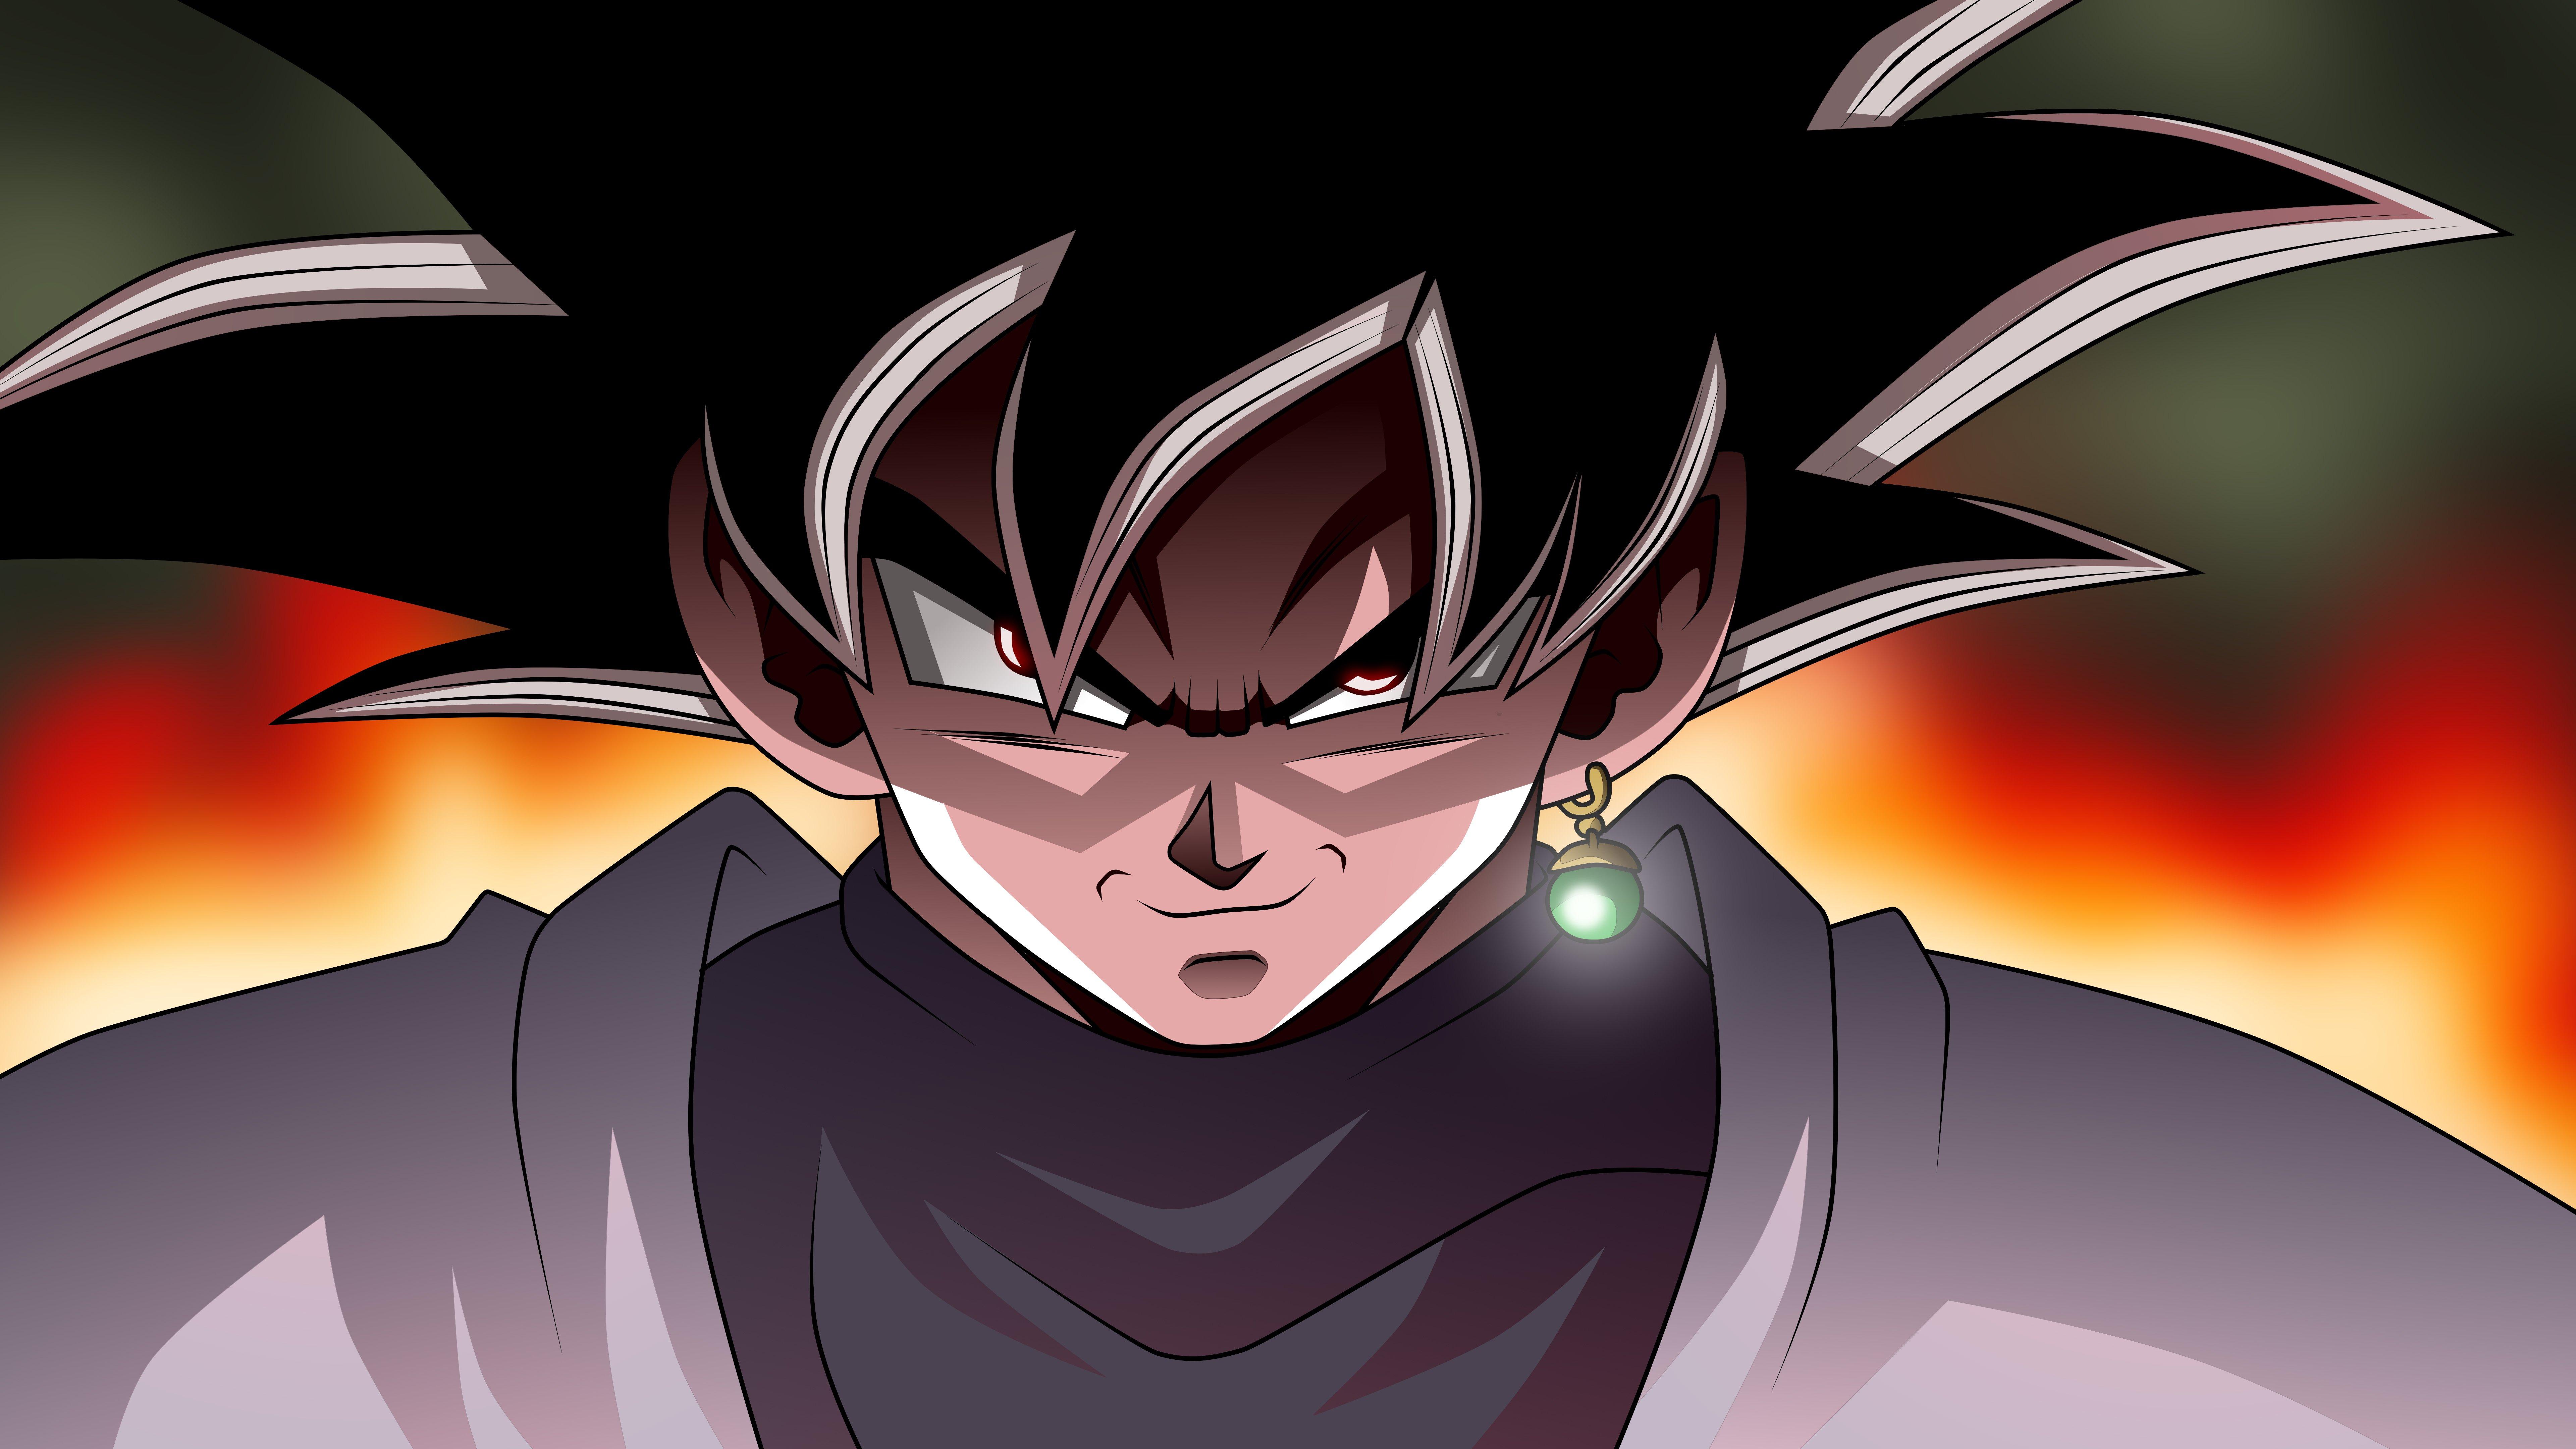 Black Goku Dragon Ball Super Anime Wallpaper 8k Ultra Hd Id 3440